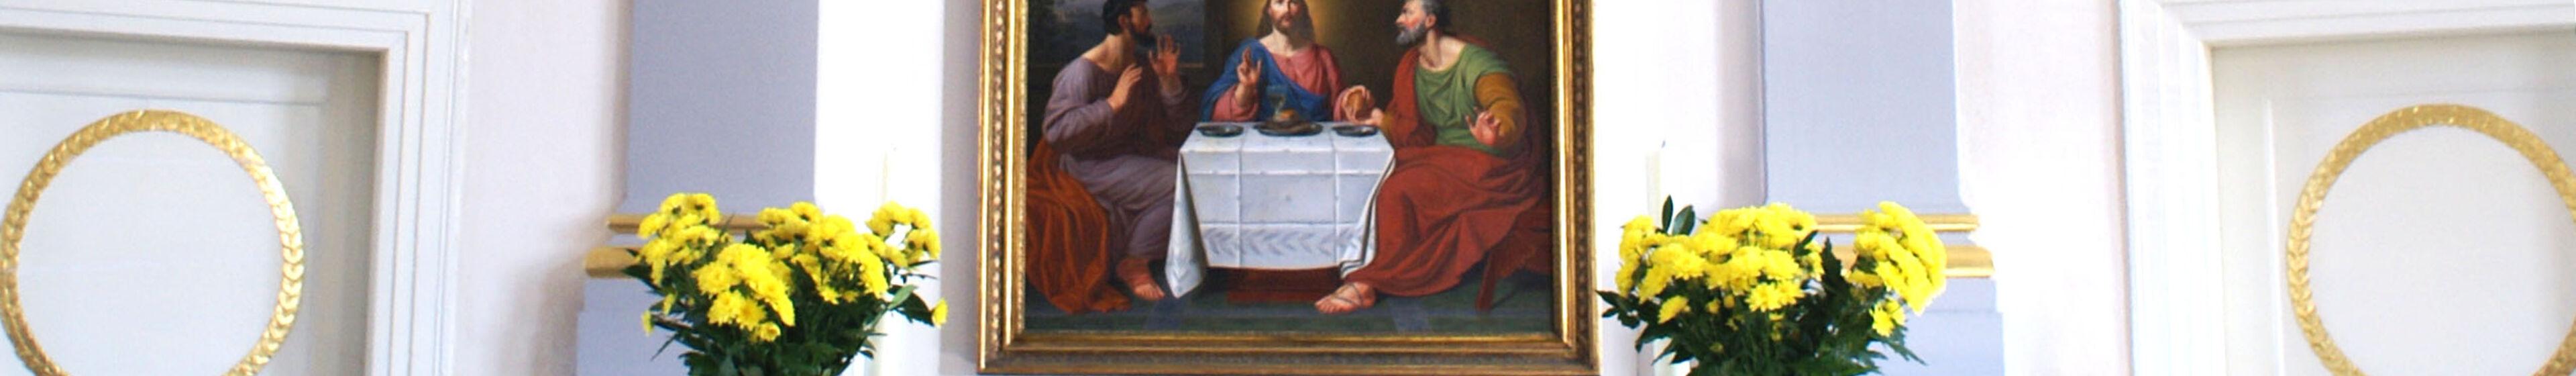 neuhaus altar kopfbild